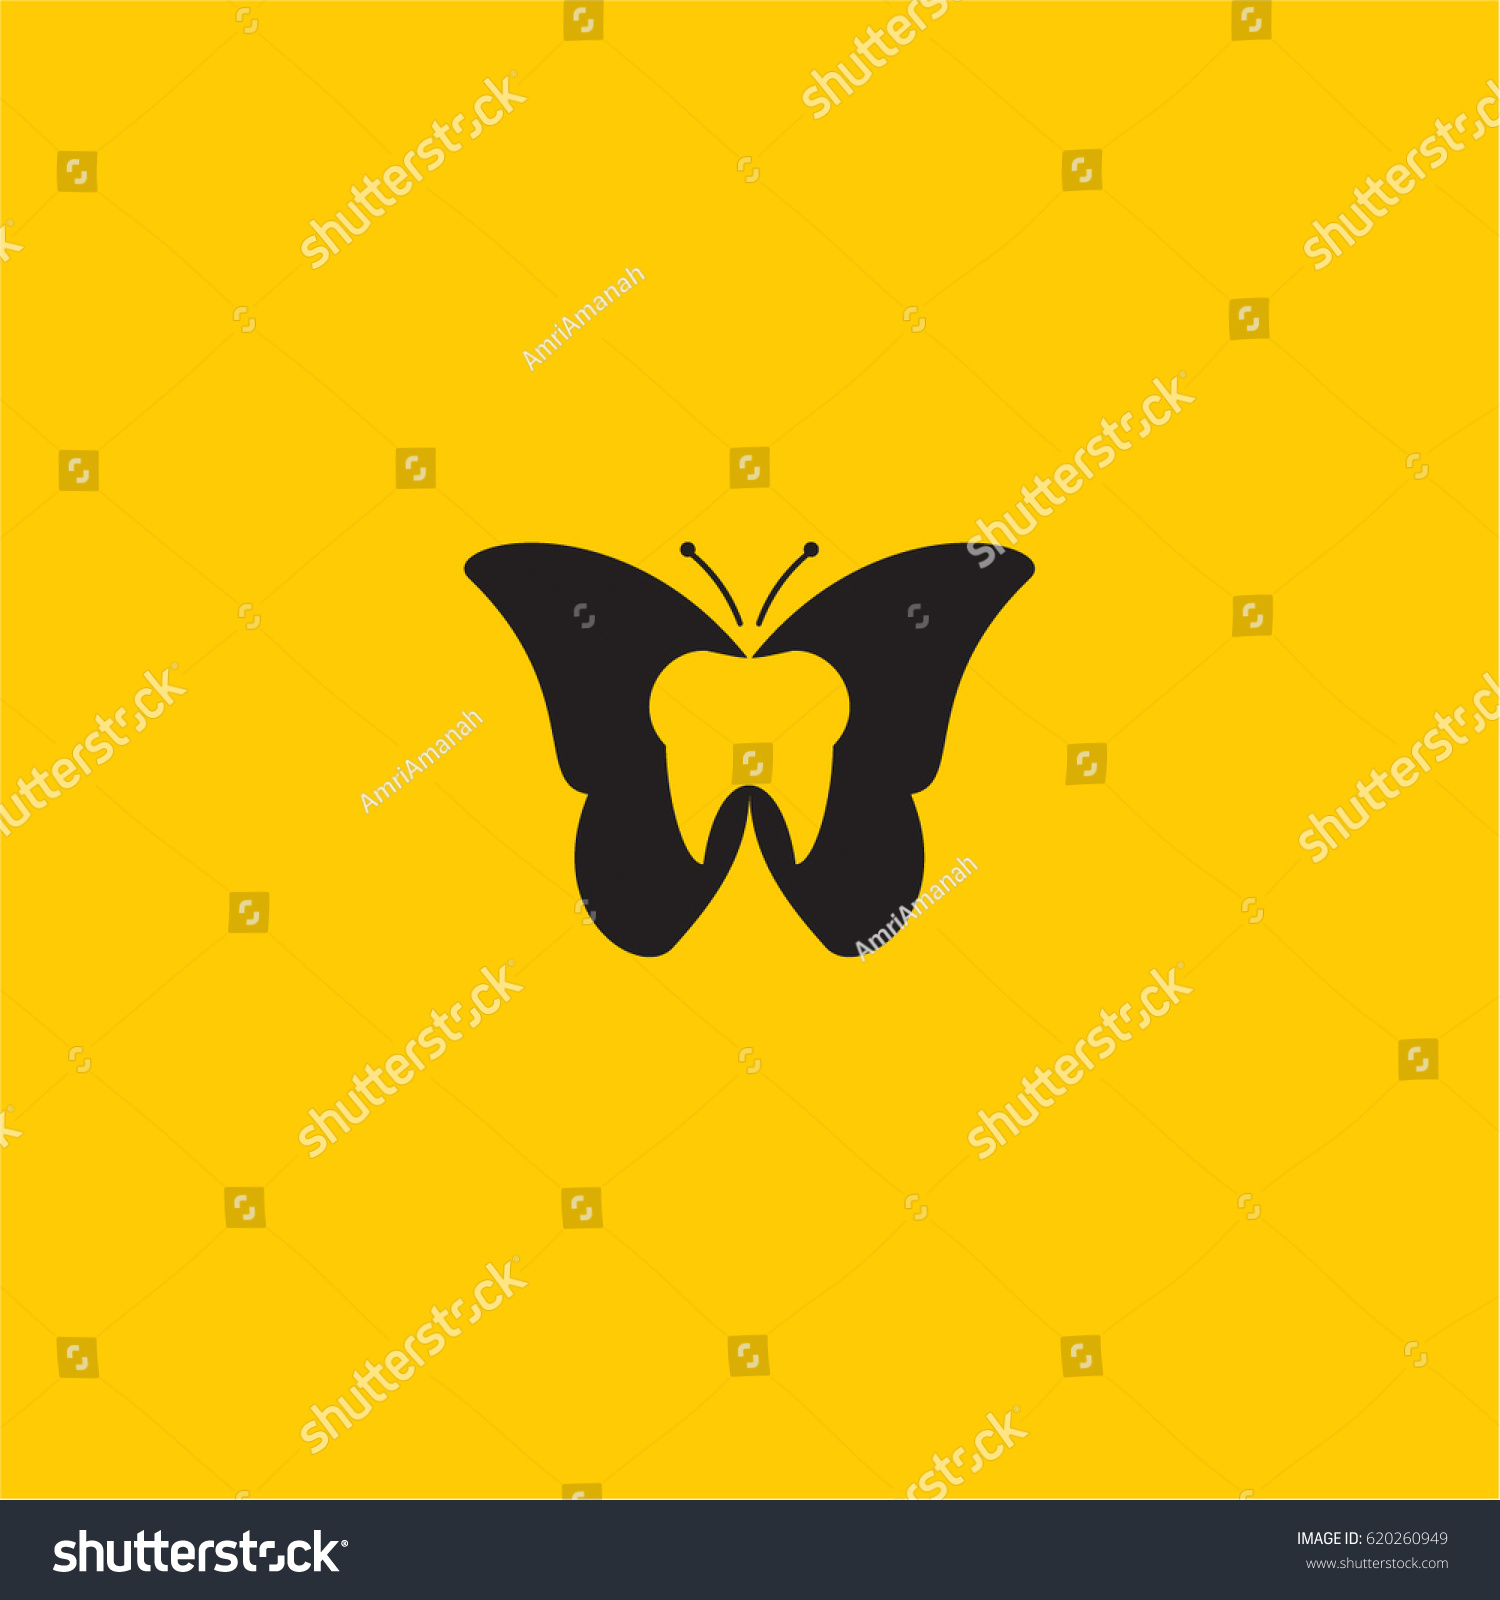 Dental dentist butterfly logo symbol stock vector 620260949 dental dentist butterfly logo symbol biocorpaavc Images